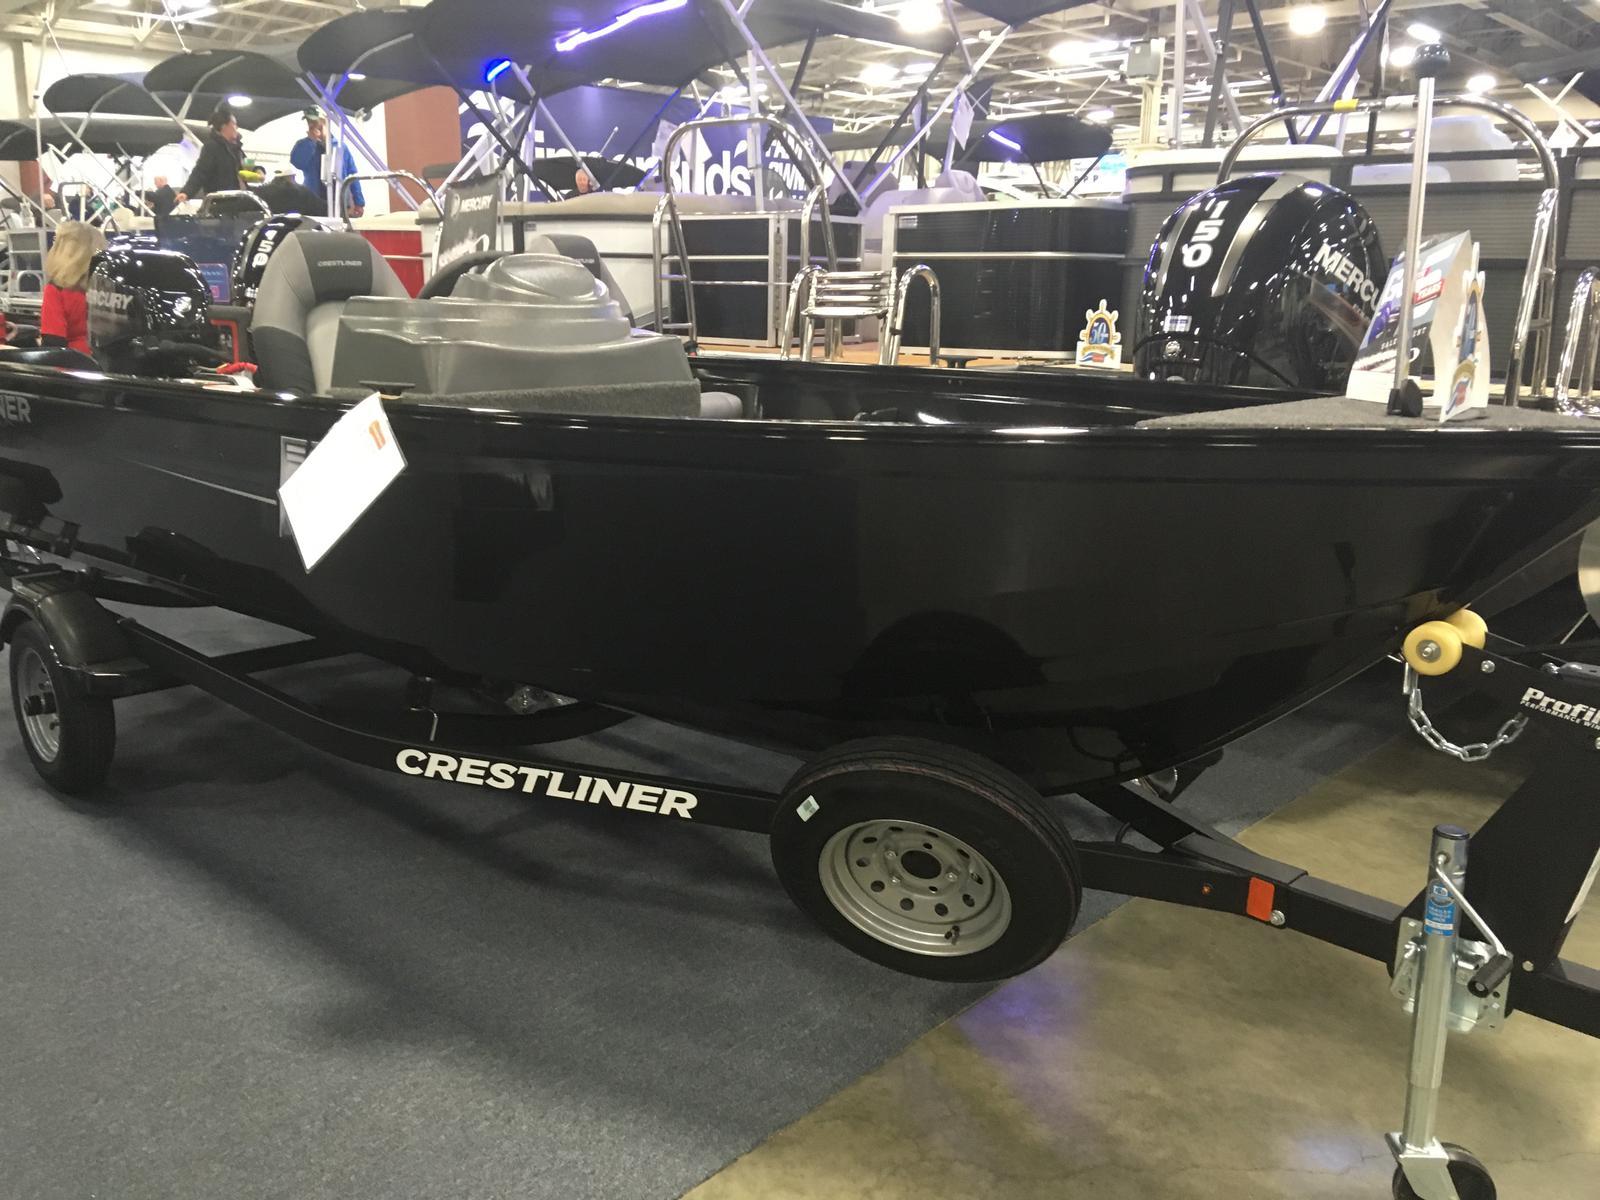 Crestliner 1650 Discovery SC